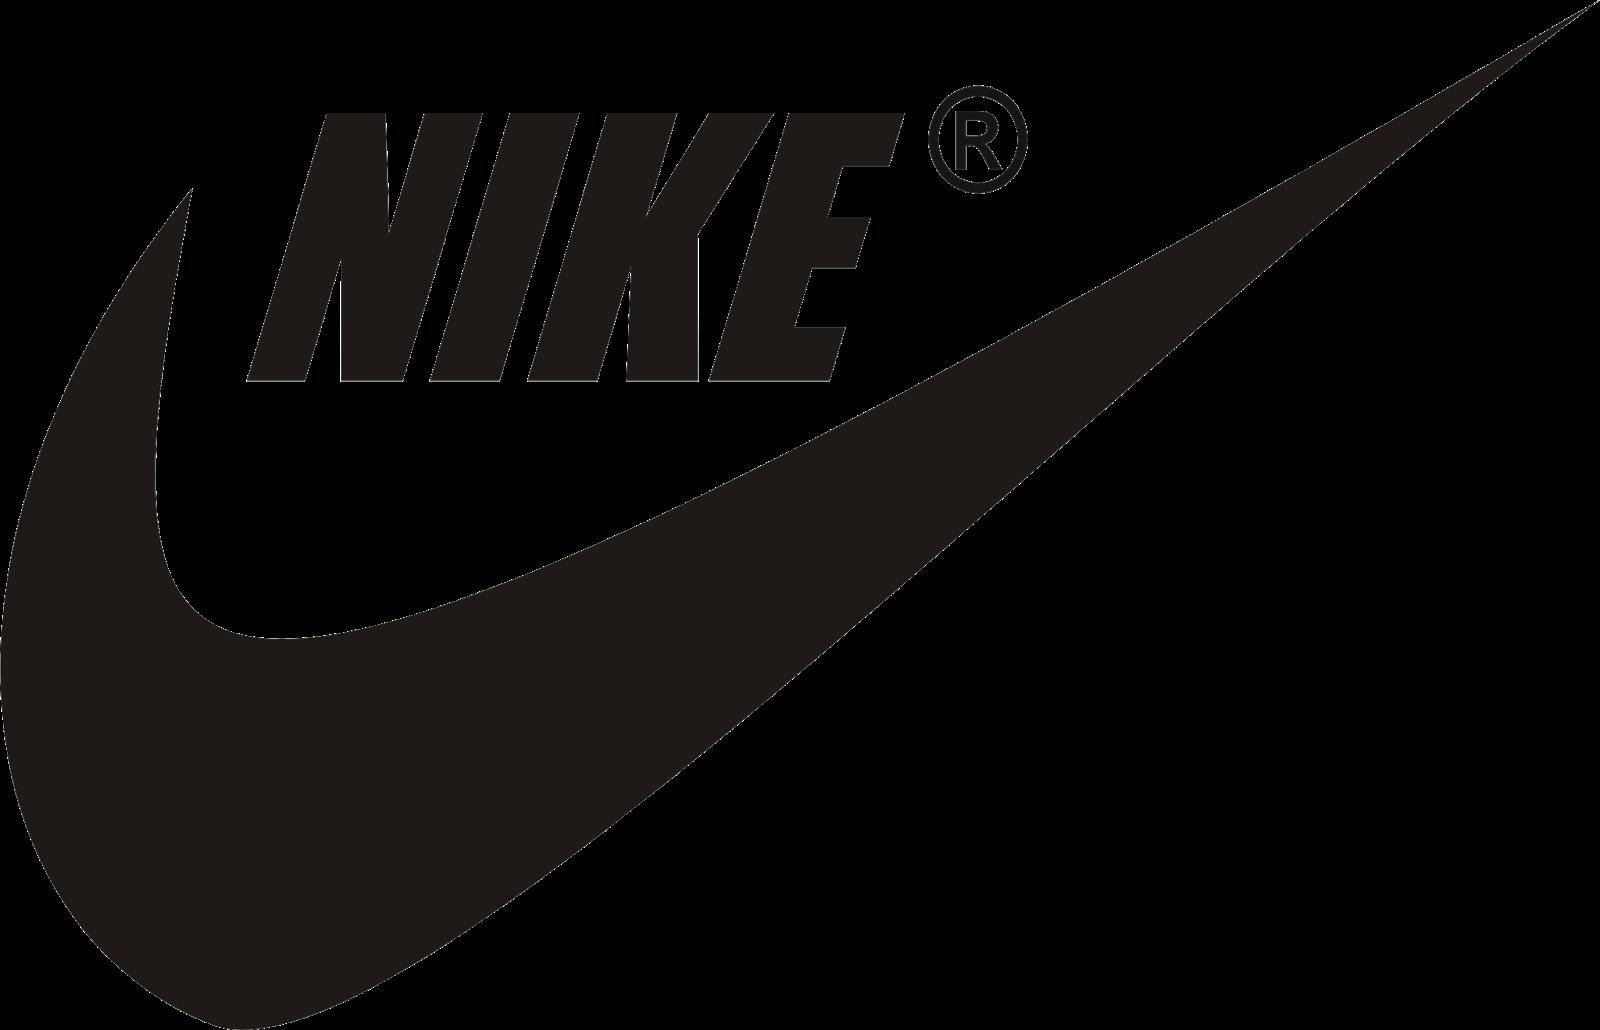 LNKG Art and Design : logotipo nike usando caneta simbolo